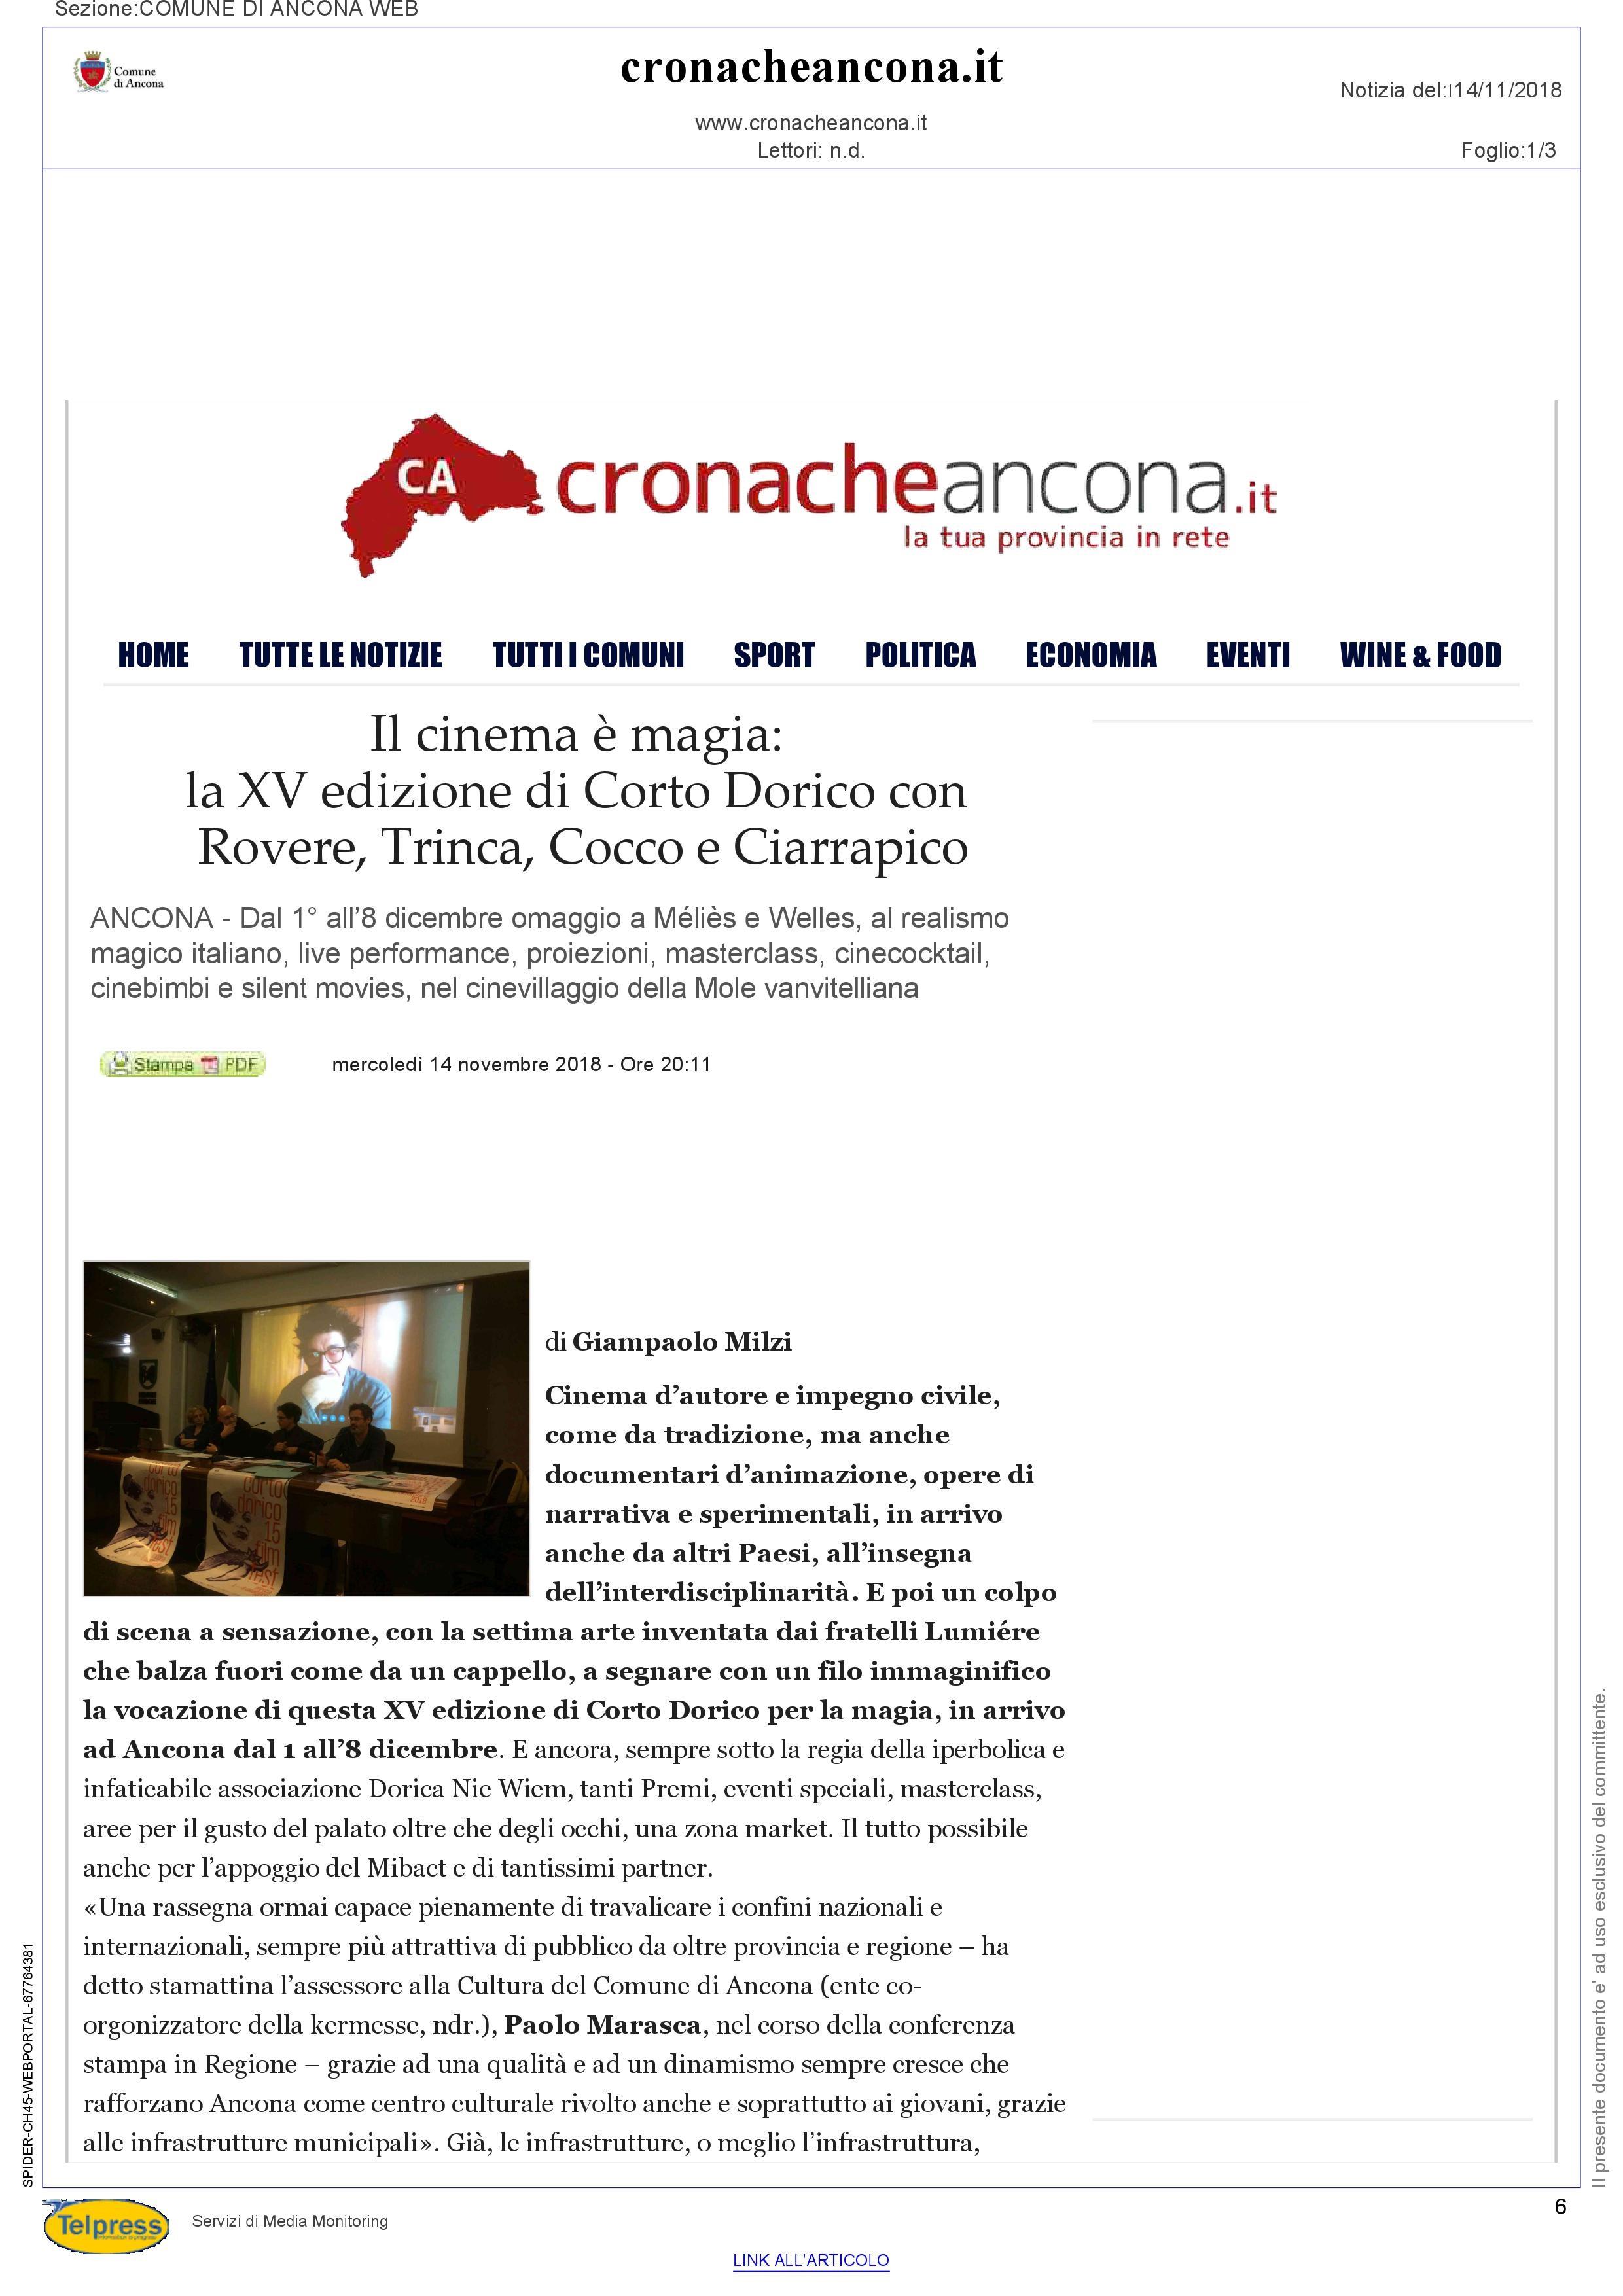 14-11-18 Cronache Ancona pag 1